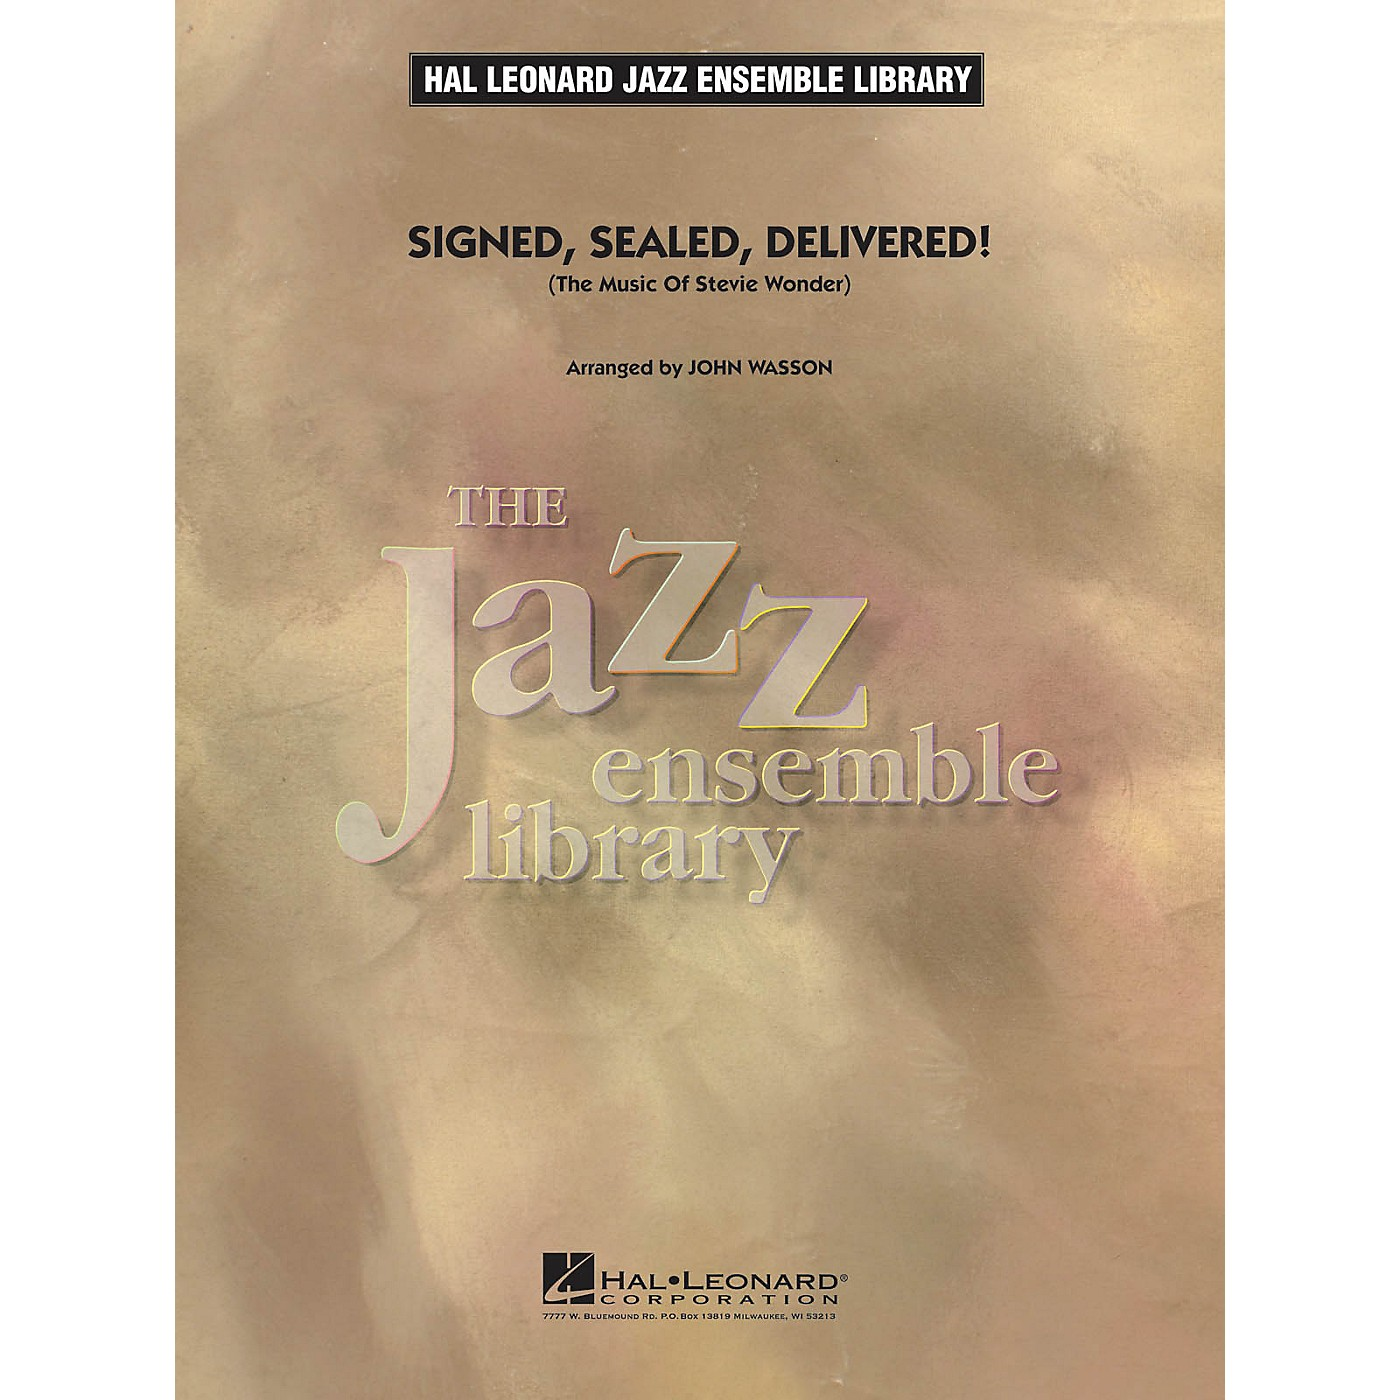 Hal Leonard Signed, Sealed, Delivered! Jazz Band Level 4 by Stevie Wonder Arranged by John Wasson thumbnail